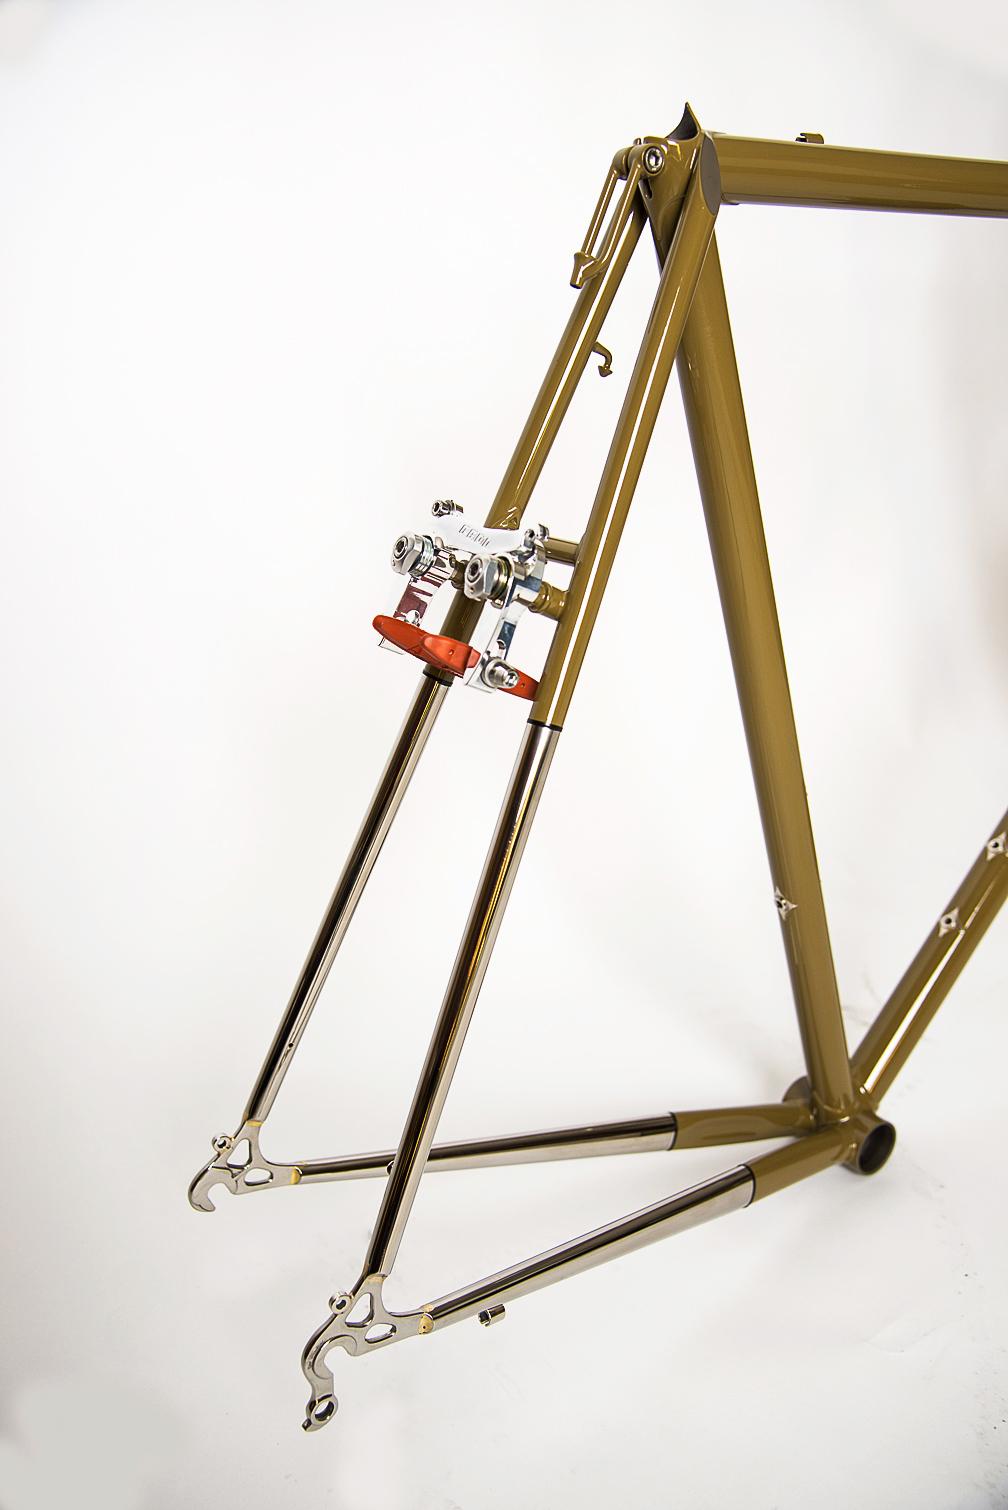 H-1 Rear Triangle